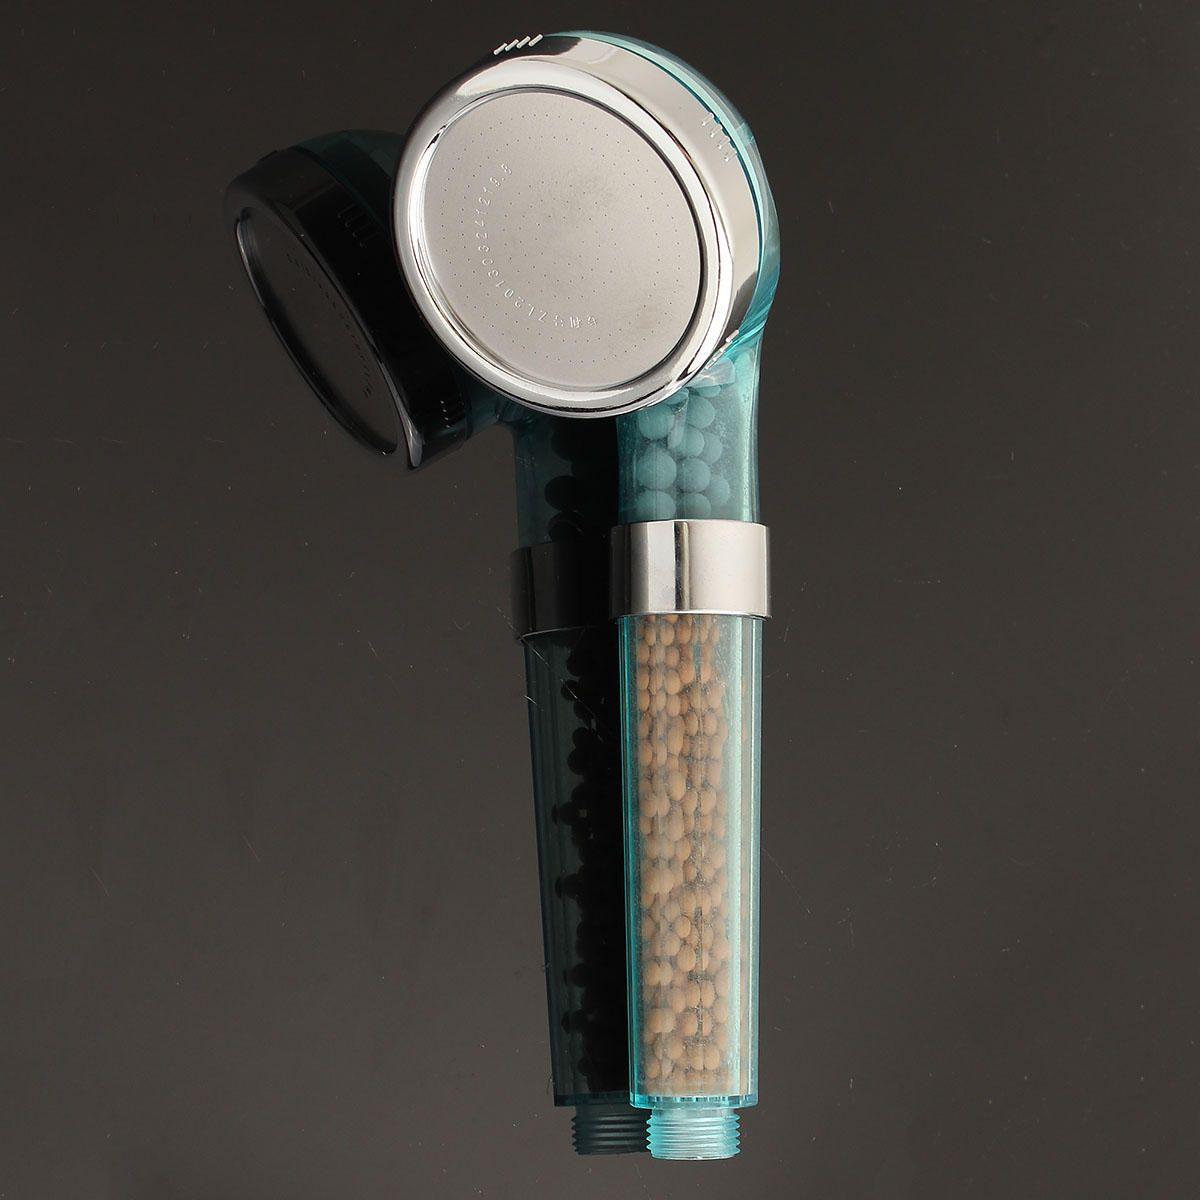 TAO US$10.18~12.18 Handheld Negative Ion SPA Pressurize Shower Head Bathroom Healthy Water Saving Spray Nozzle